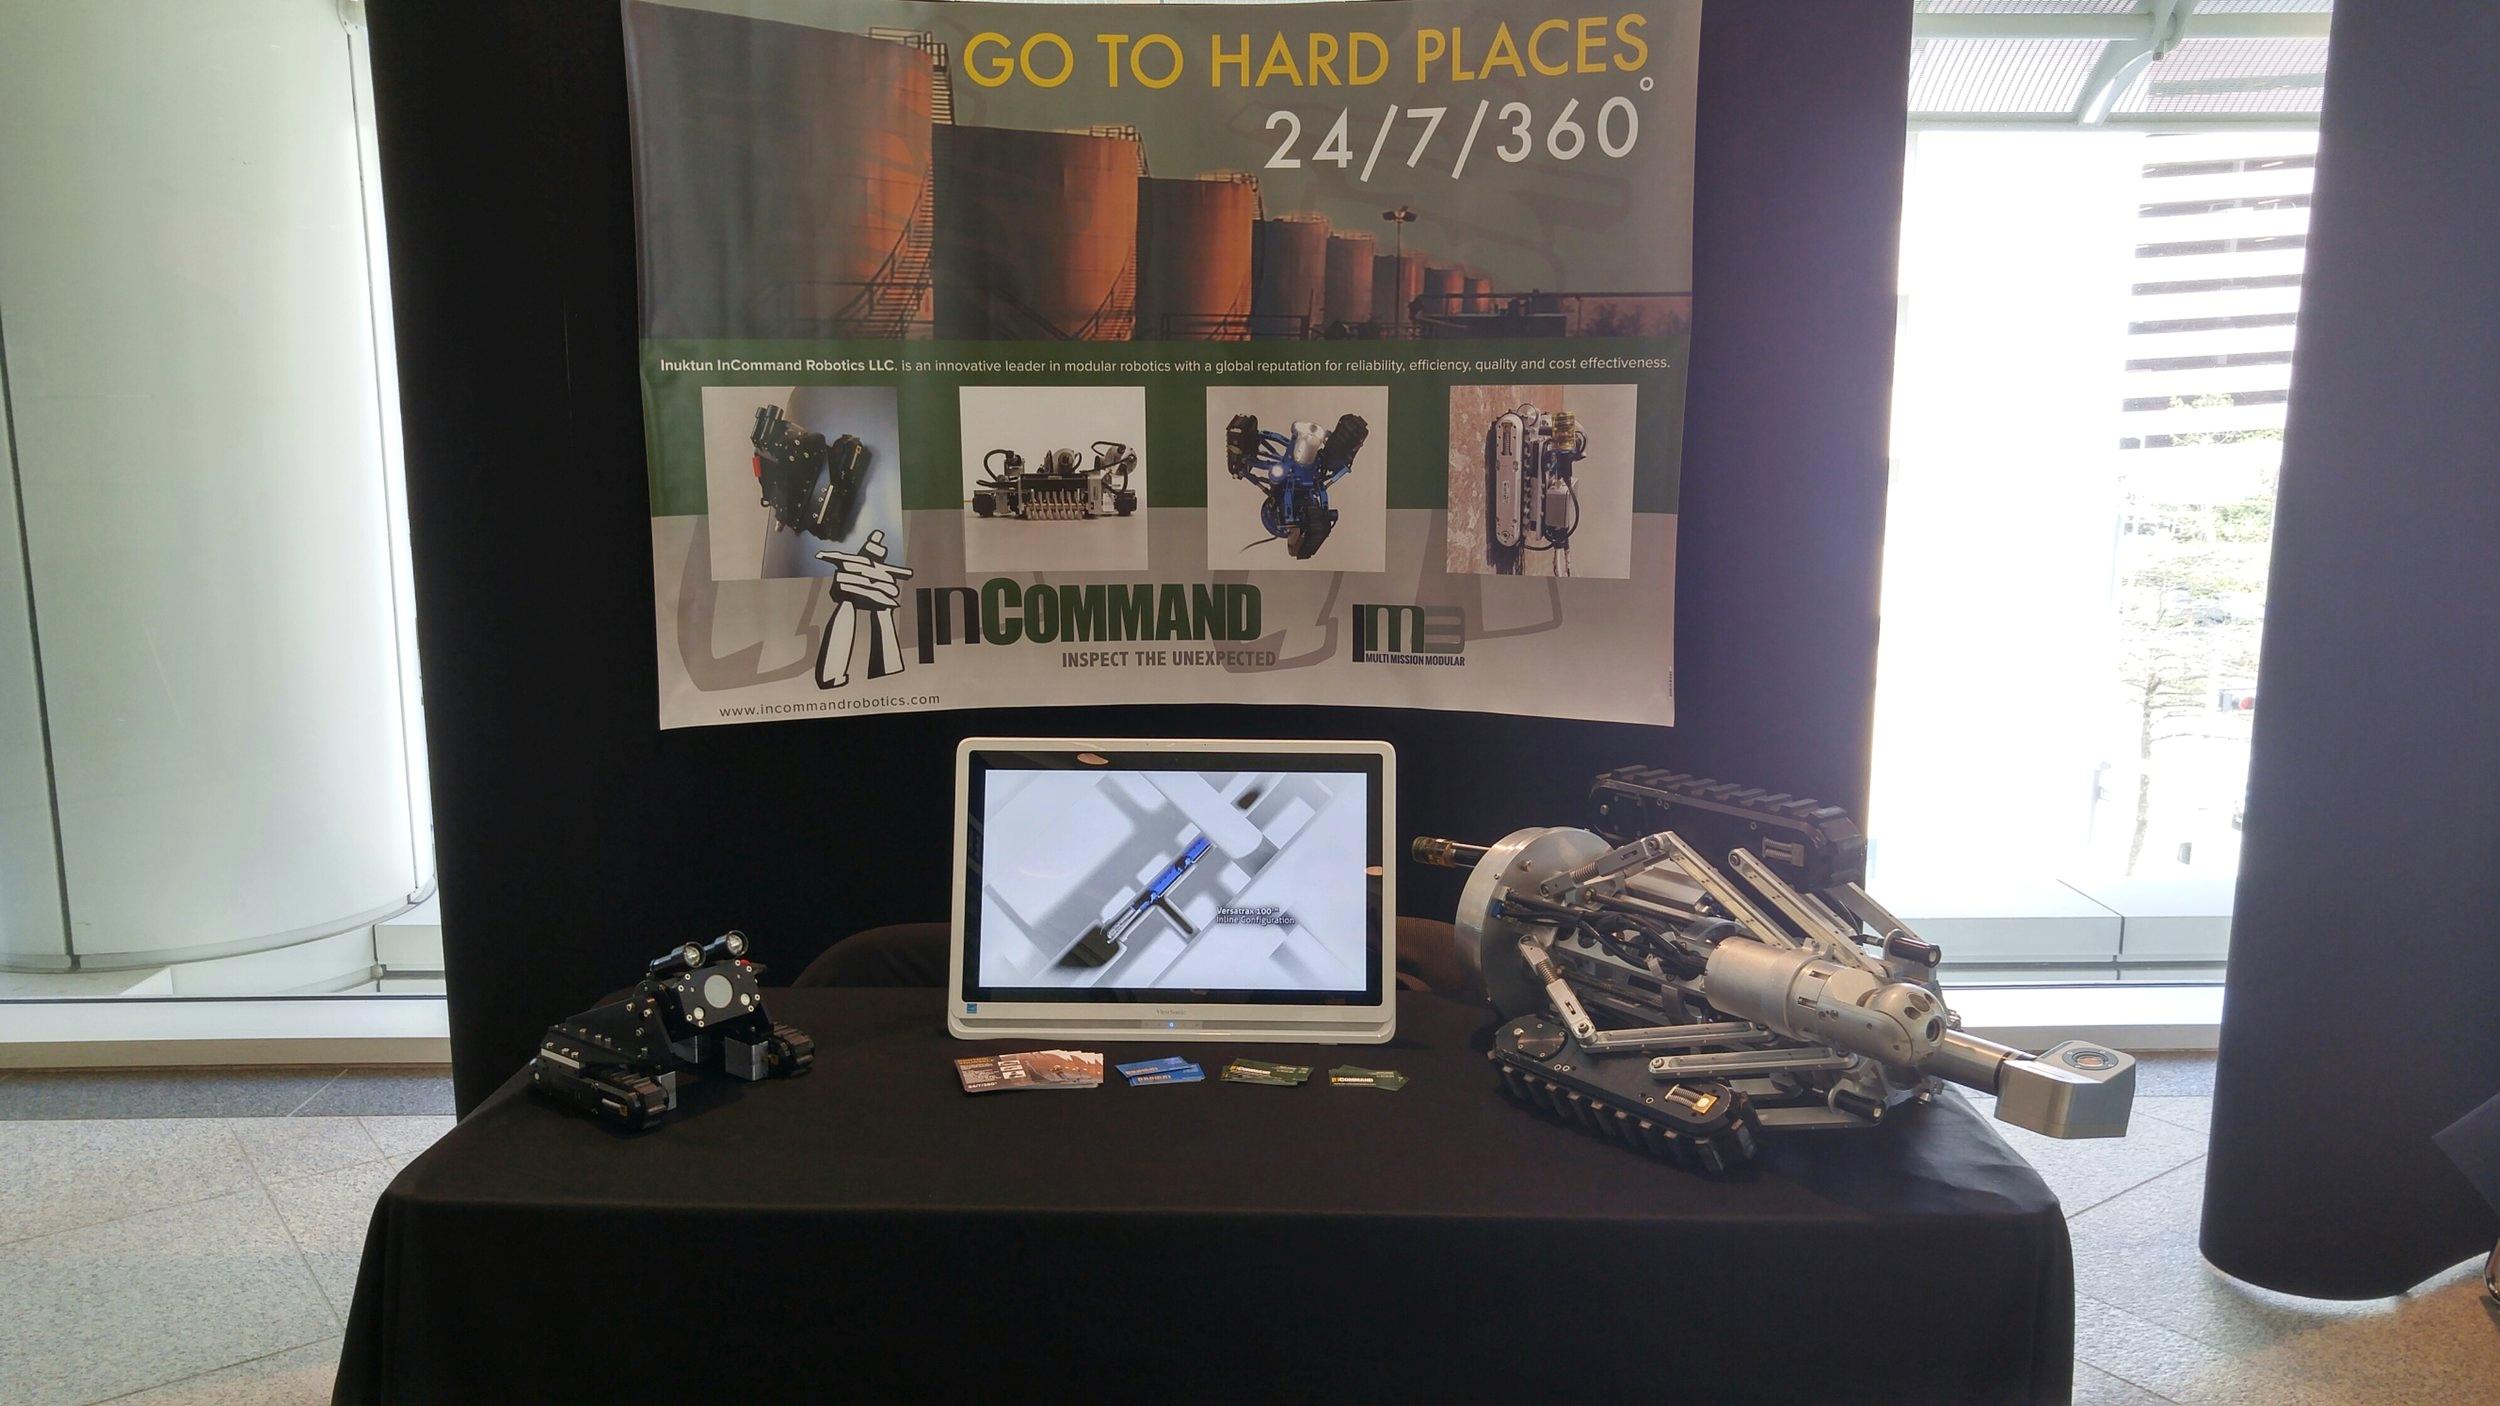 Inuktun InCommand Robotics at the SPRINT Robotics Seminar 2016